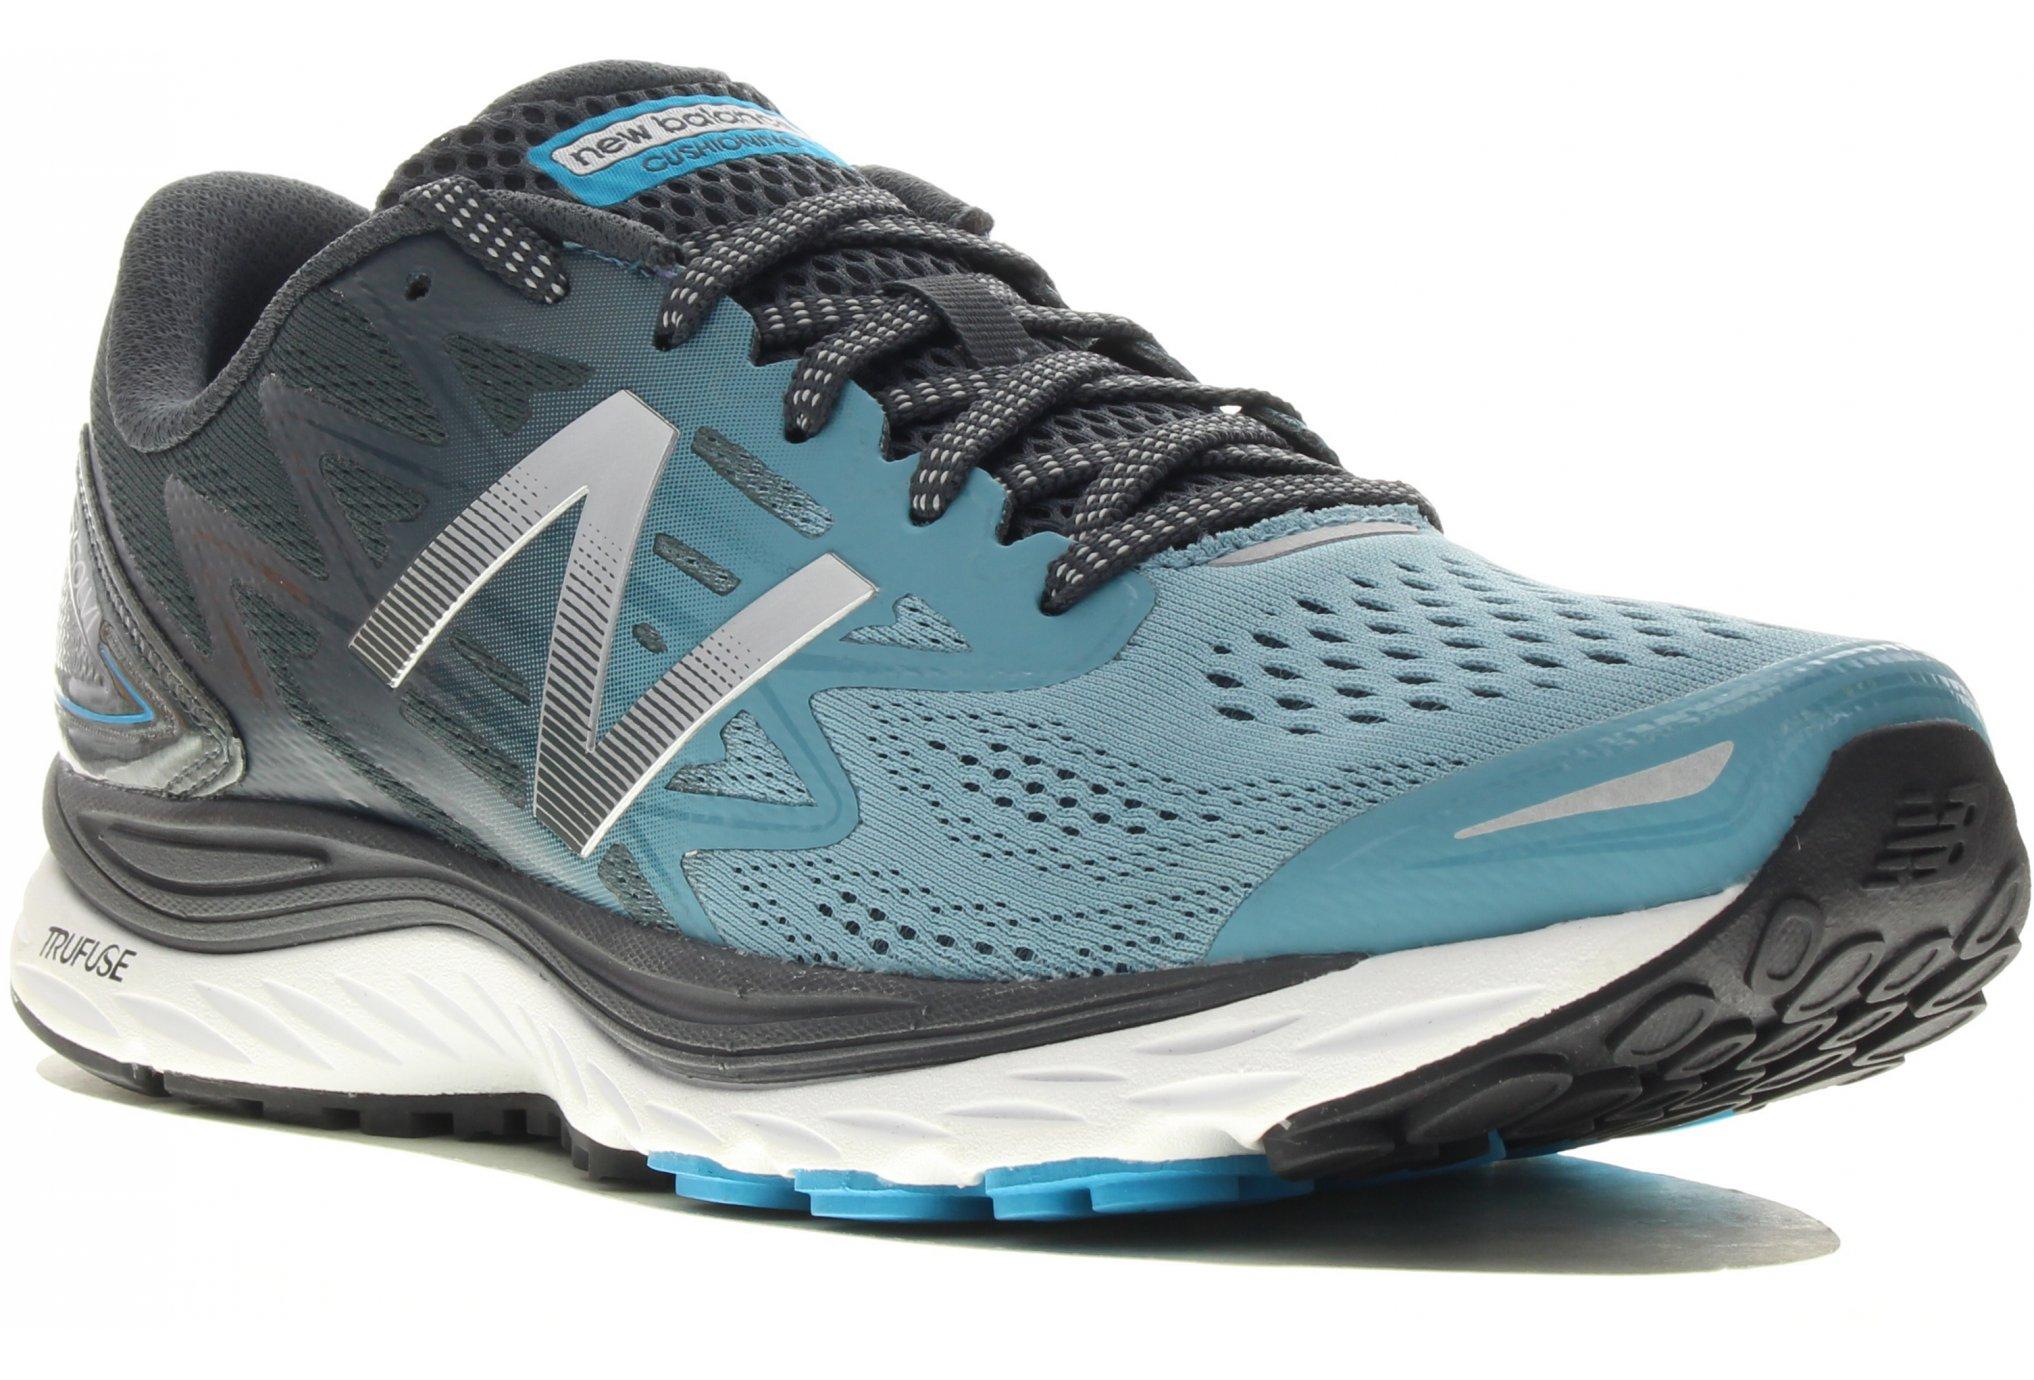 New Balance M Solvi-D Chaussures homme